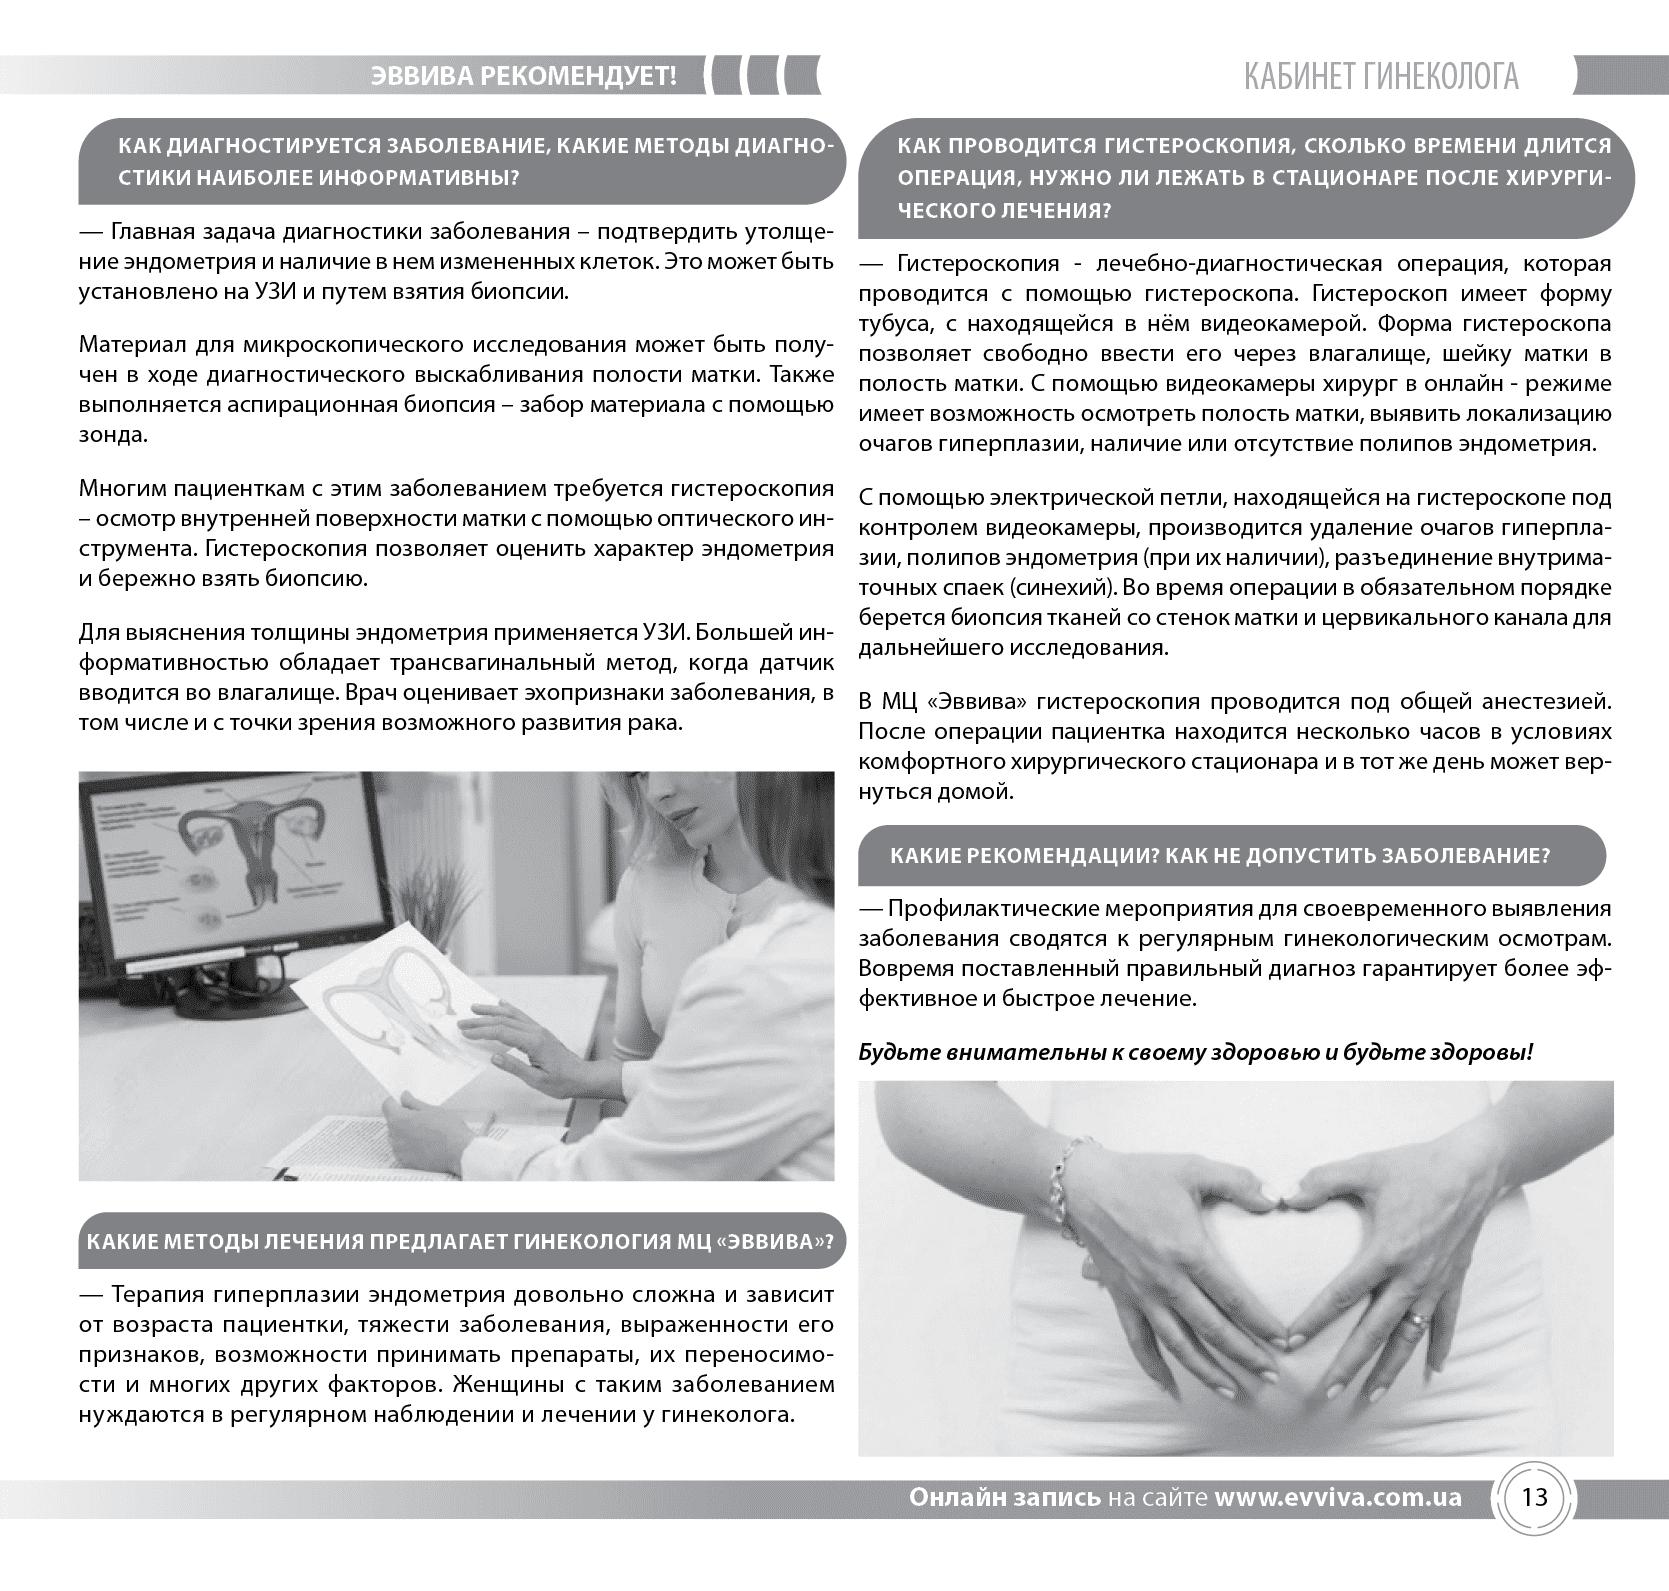 evviva-zhurnal-118-page13